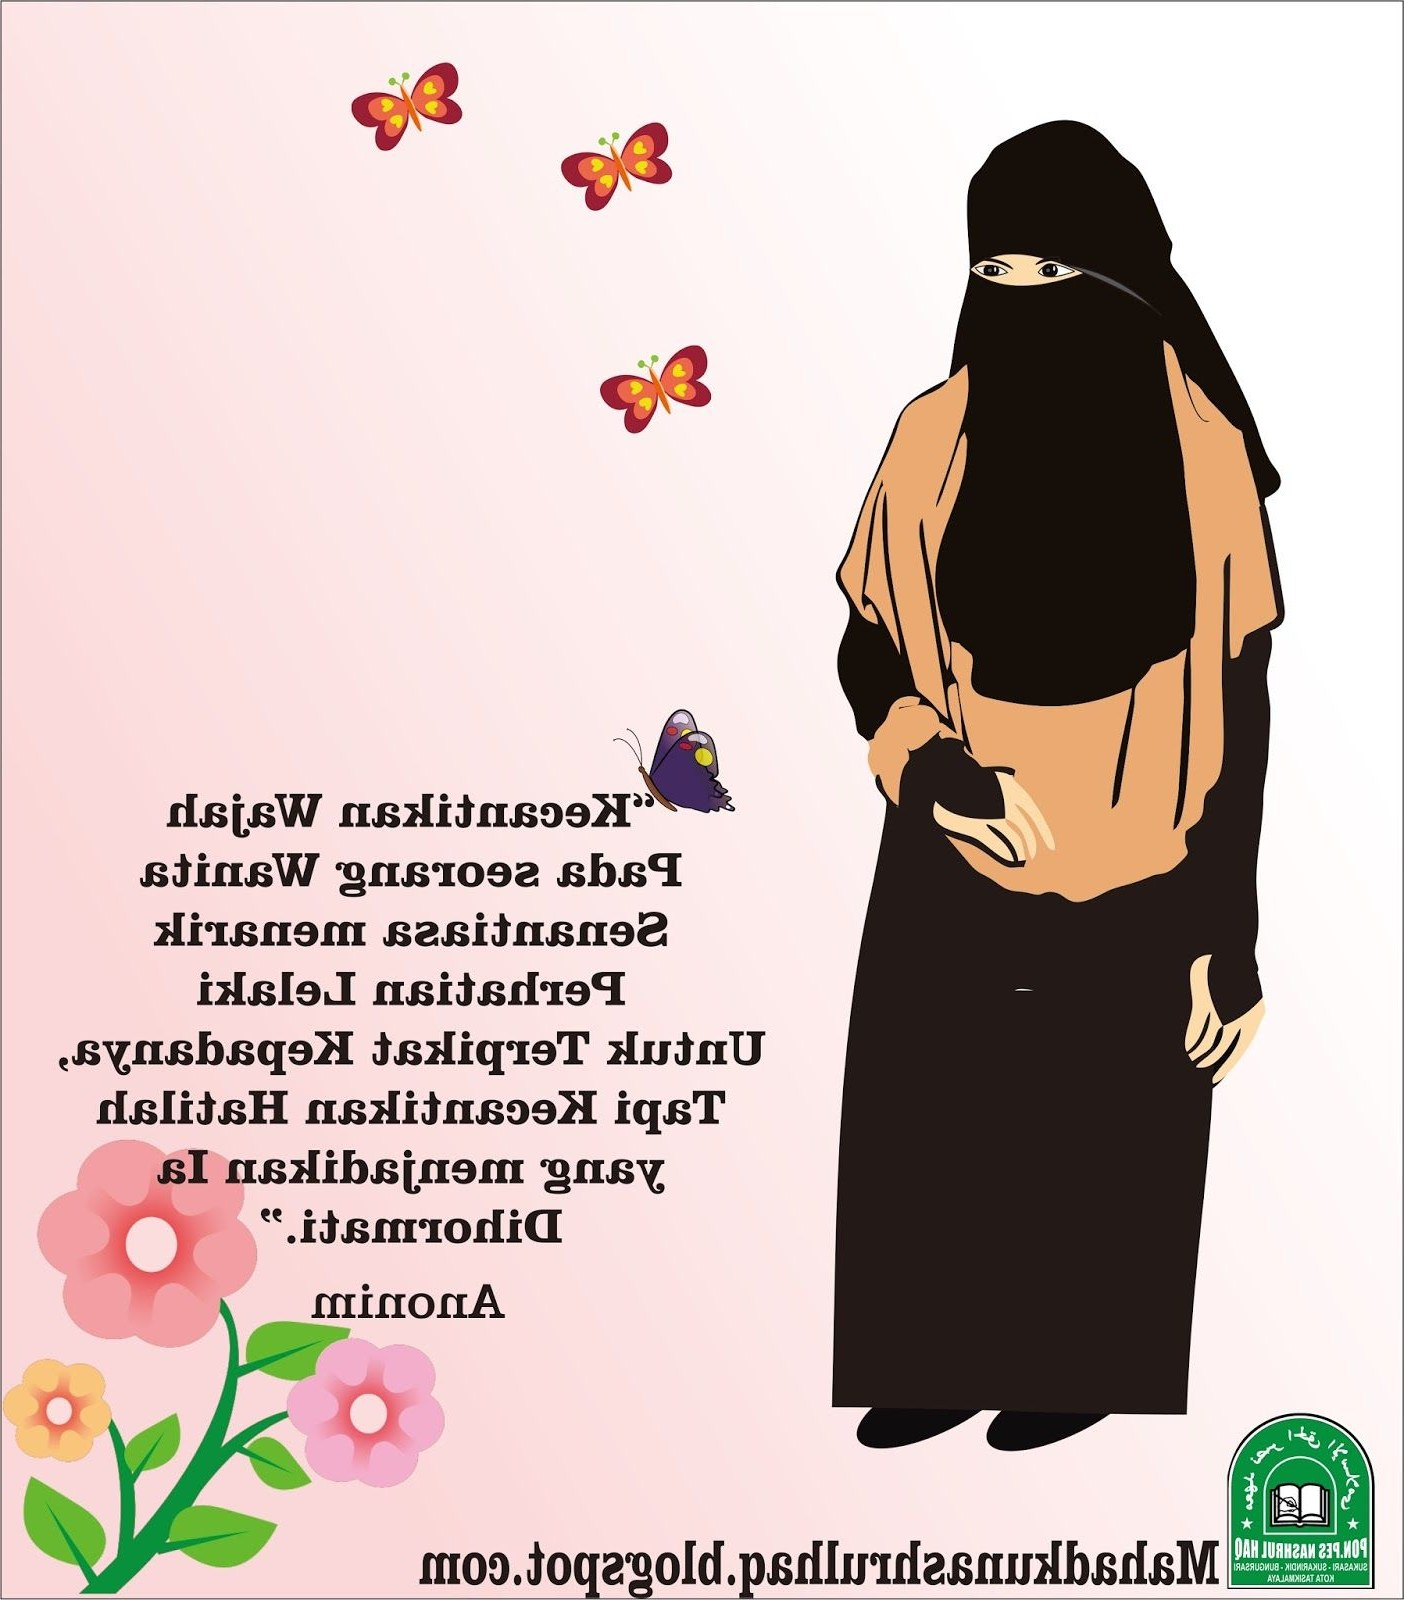 Design Muslimah Bercadar Cantik S5d8 Gambar Kartun Muslimah Bercadar Tentang Kecantikan Hati